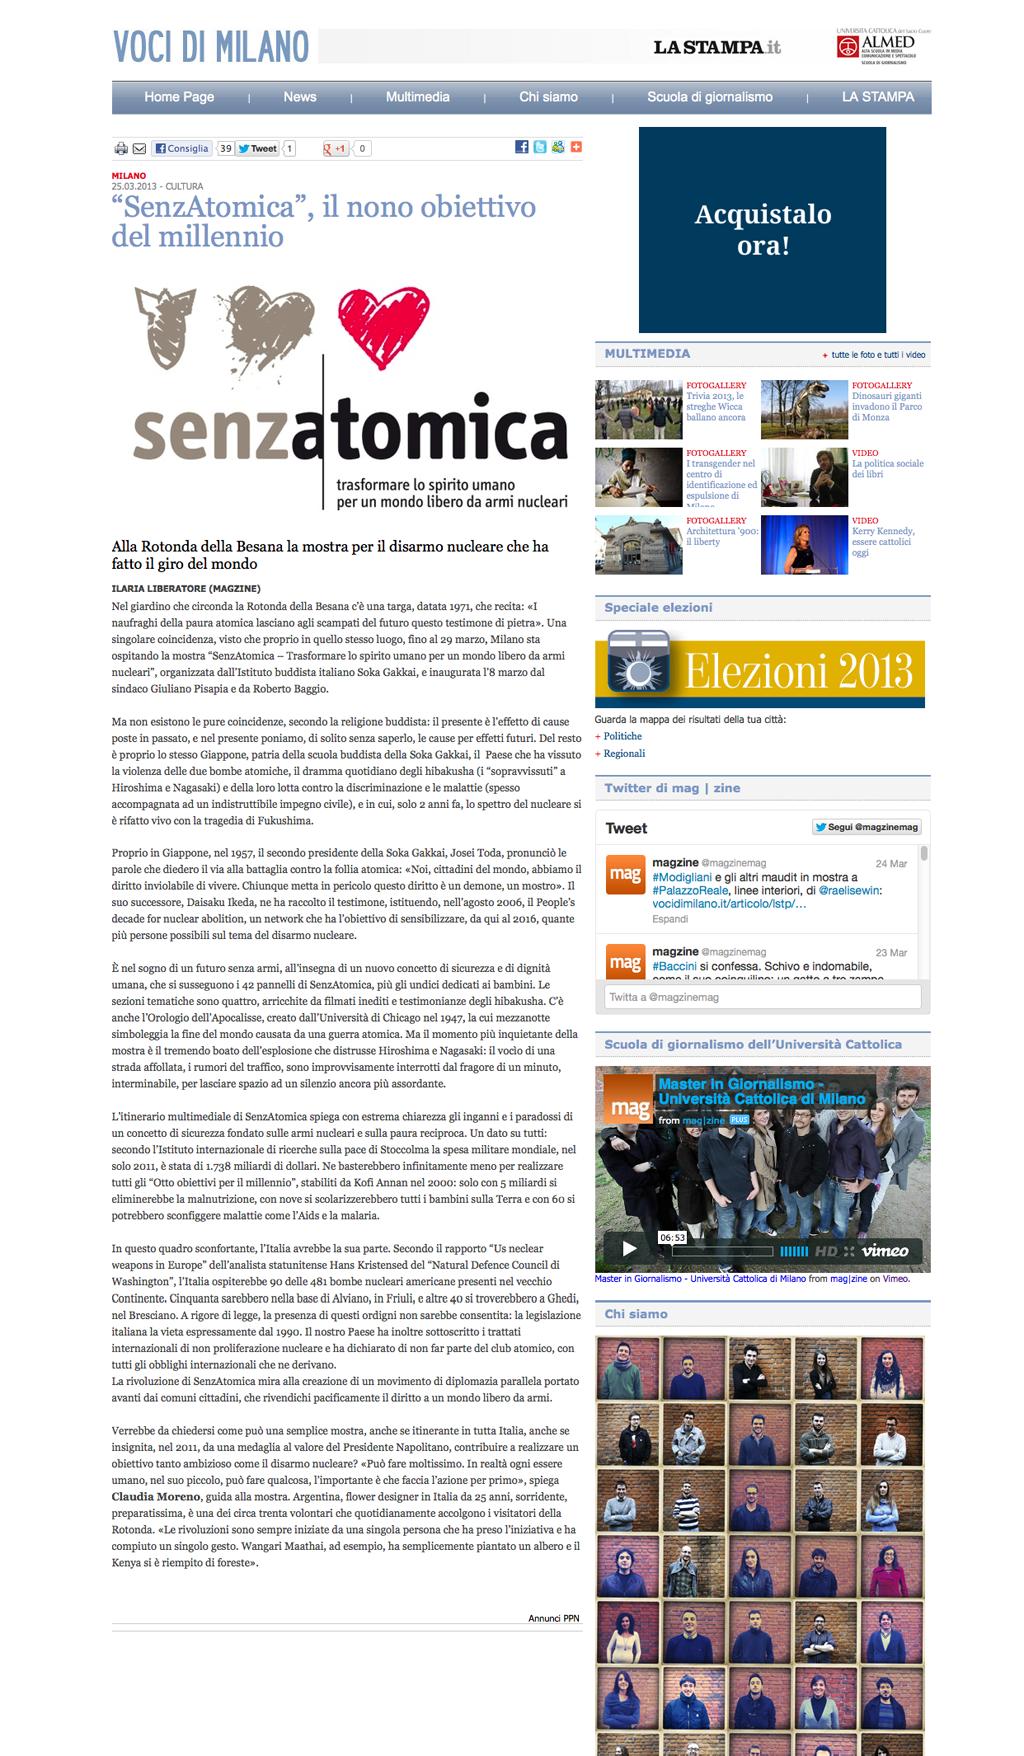 2013-03-25 La Stampa